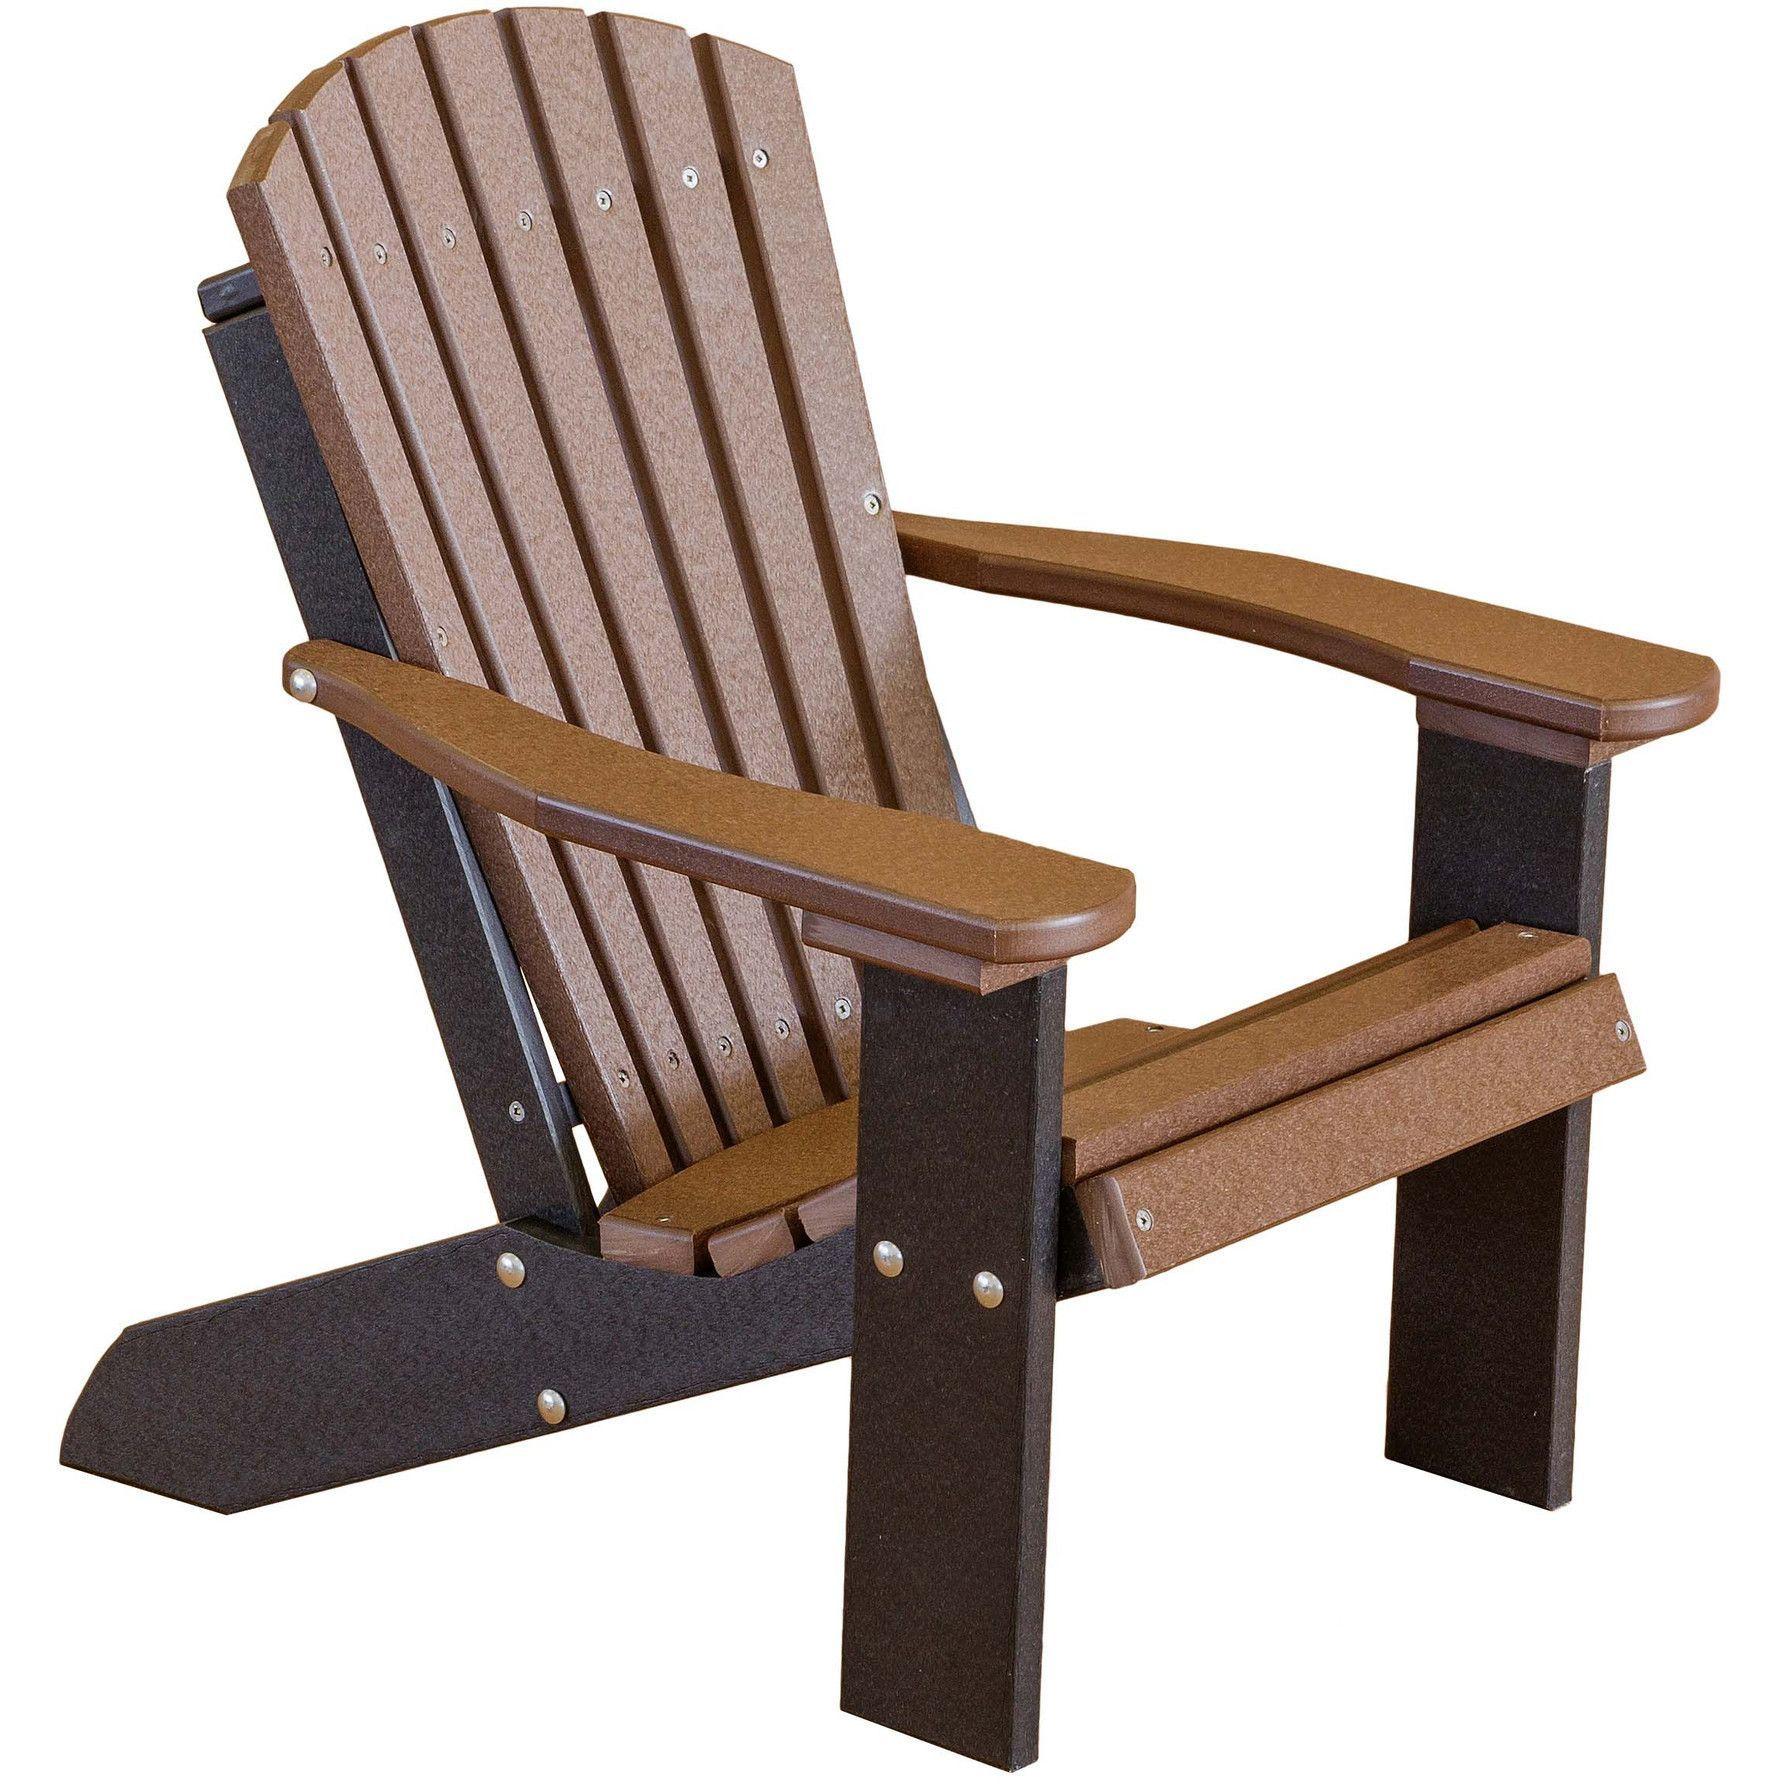 childrens adirondack chair plastic all weather white wicker rocking chairs wildridge outdoor recycled children s